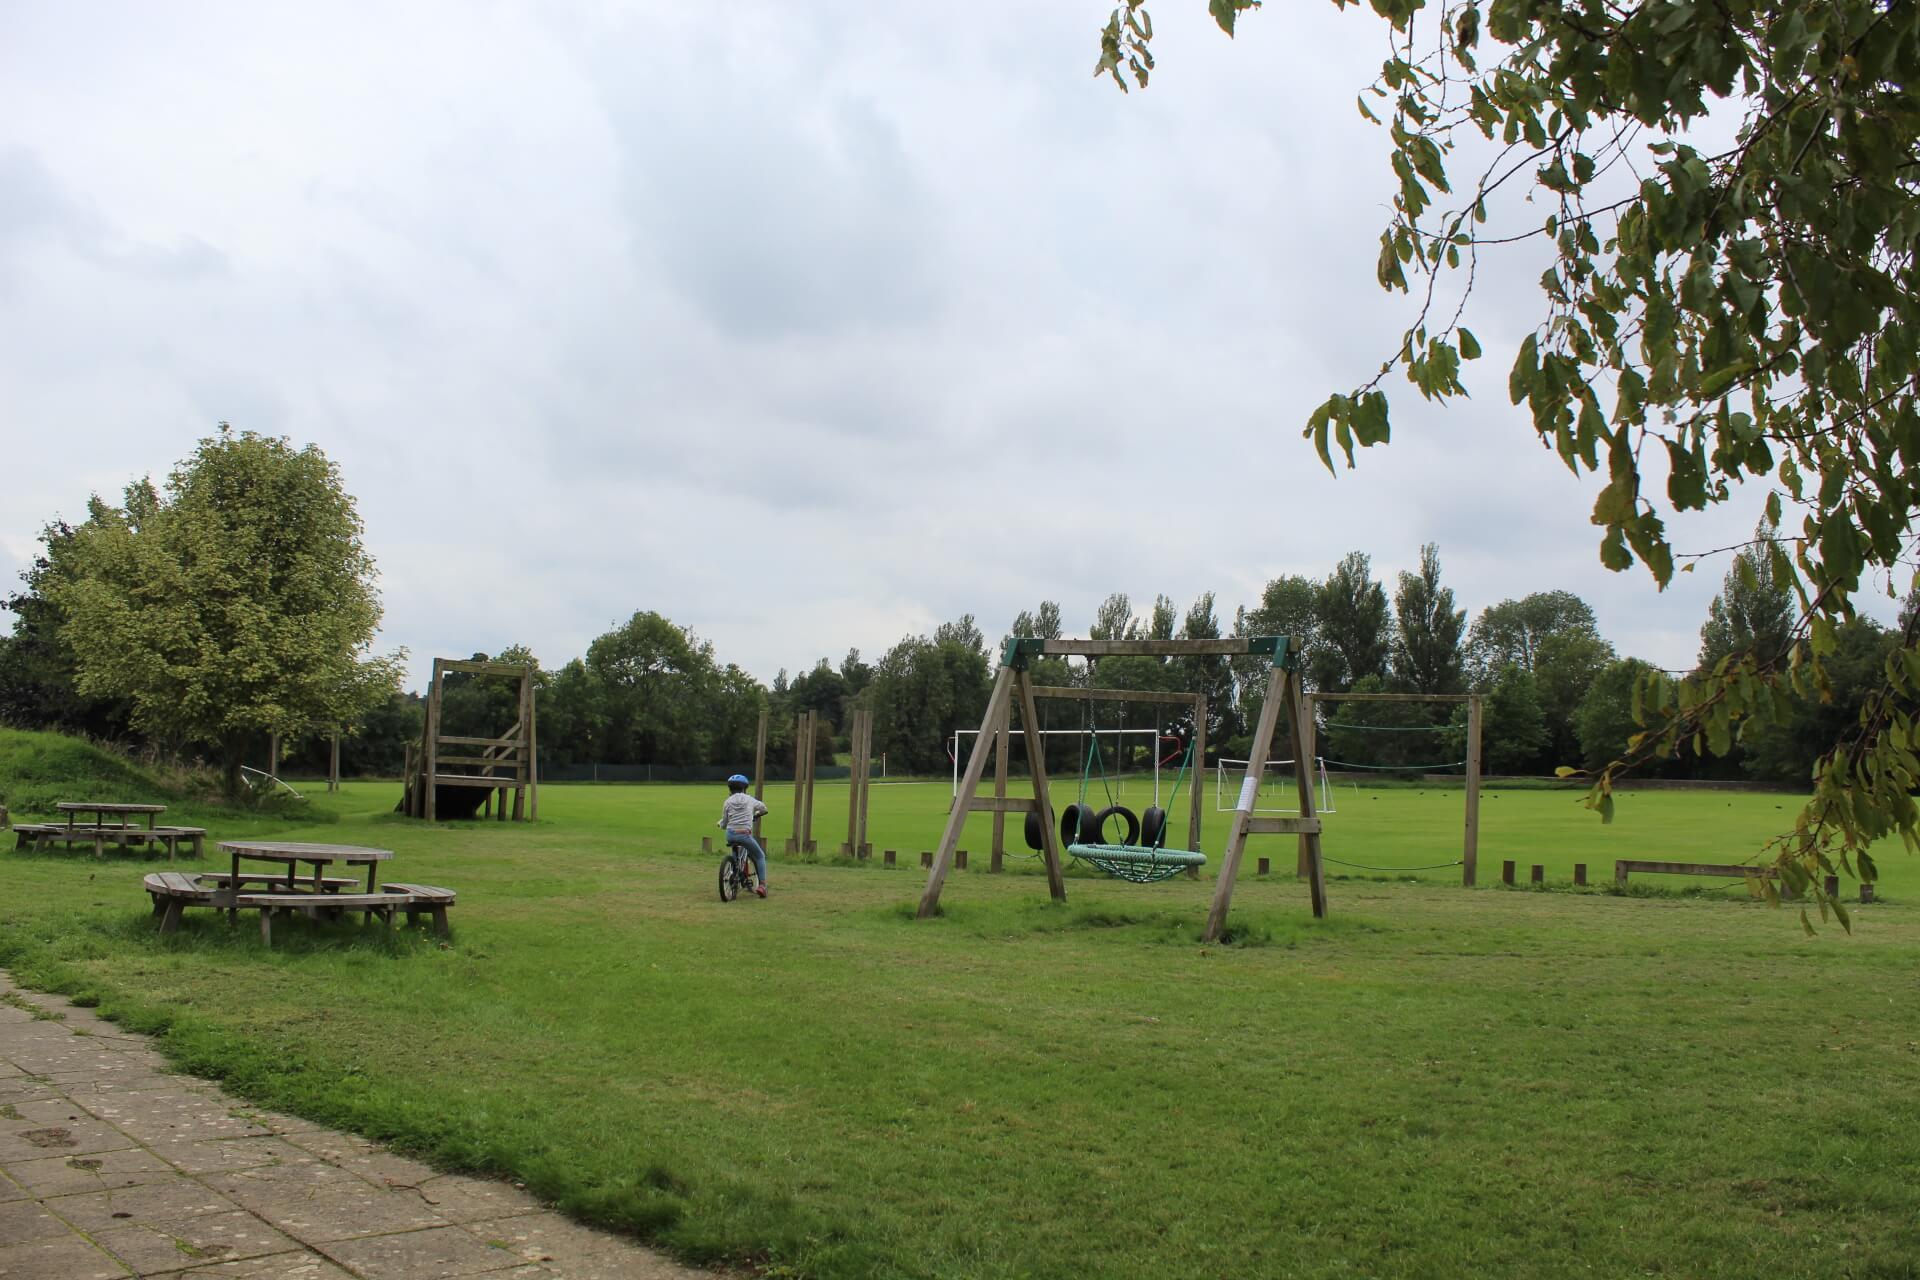 Playground at Didmarton Village Hall